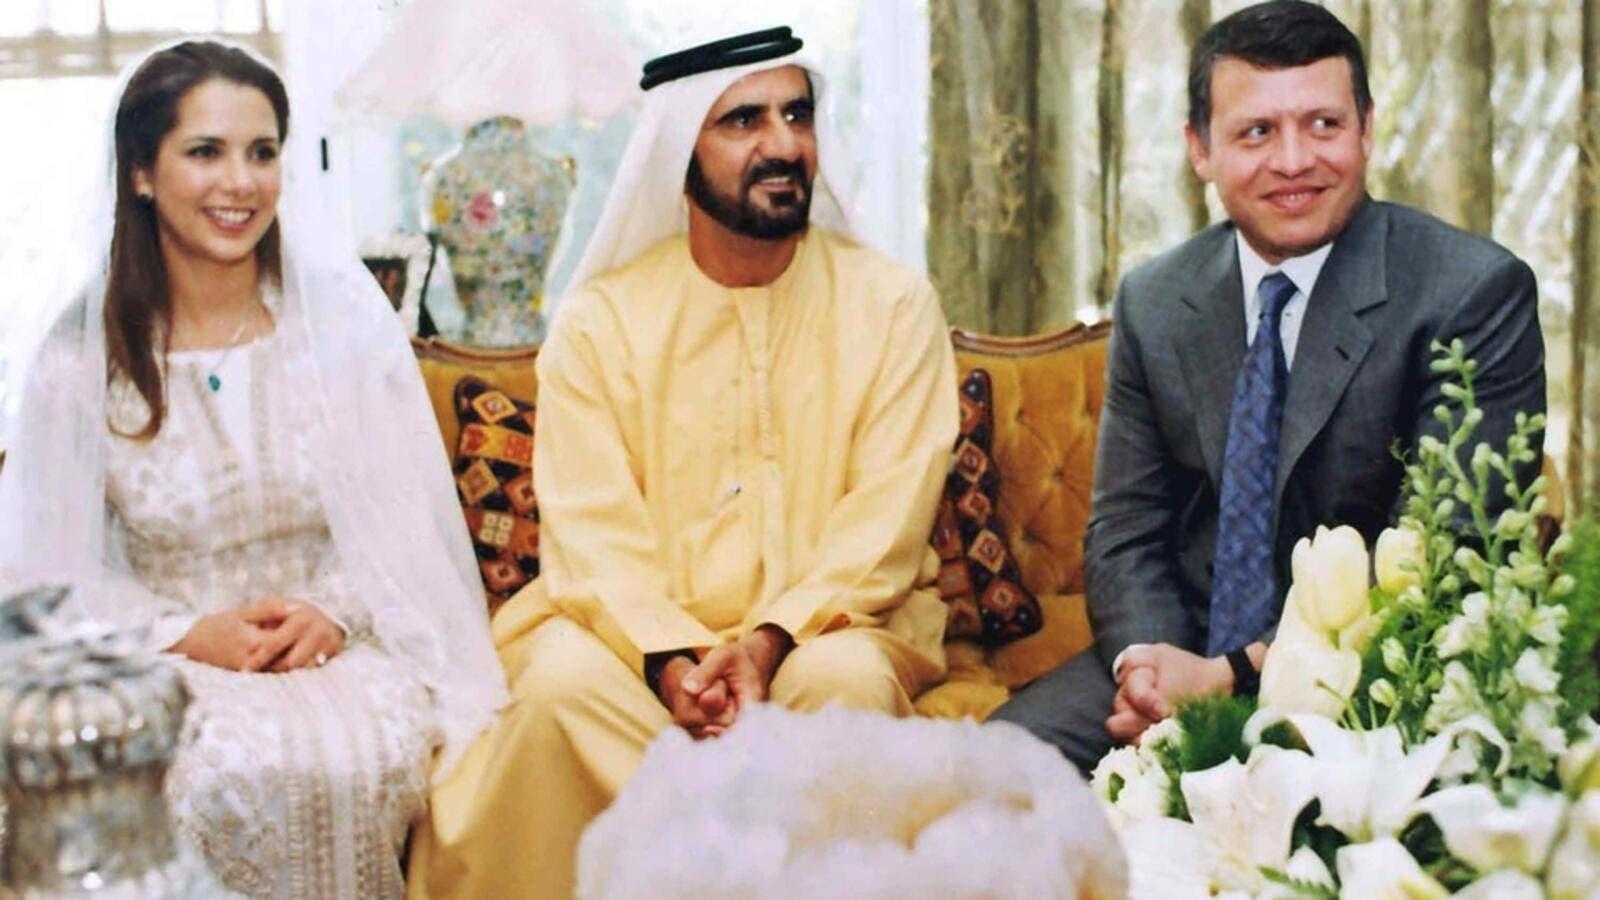 Osama Fawzi Shares Crazy Rumor that Jordanian Princess Haya Has